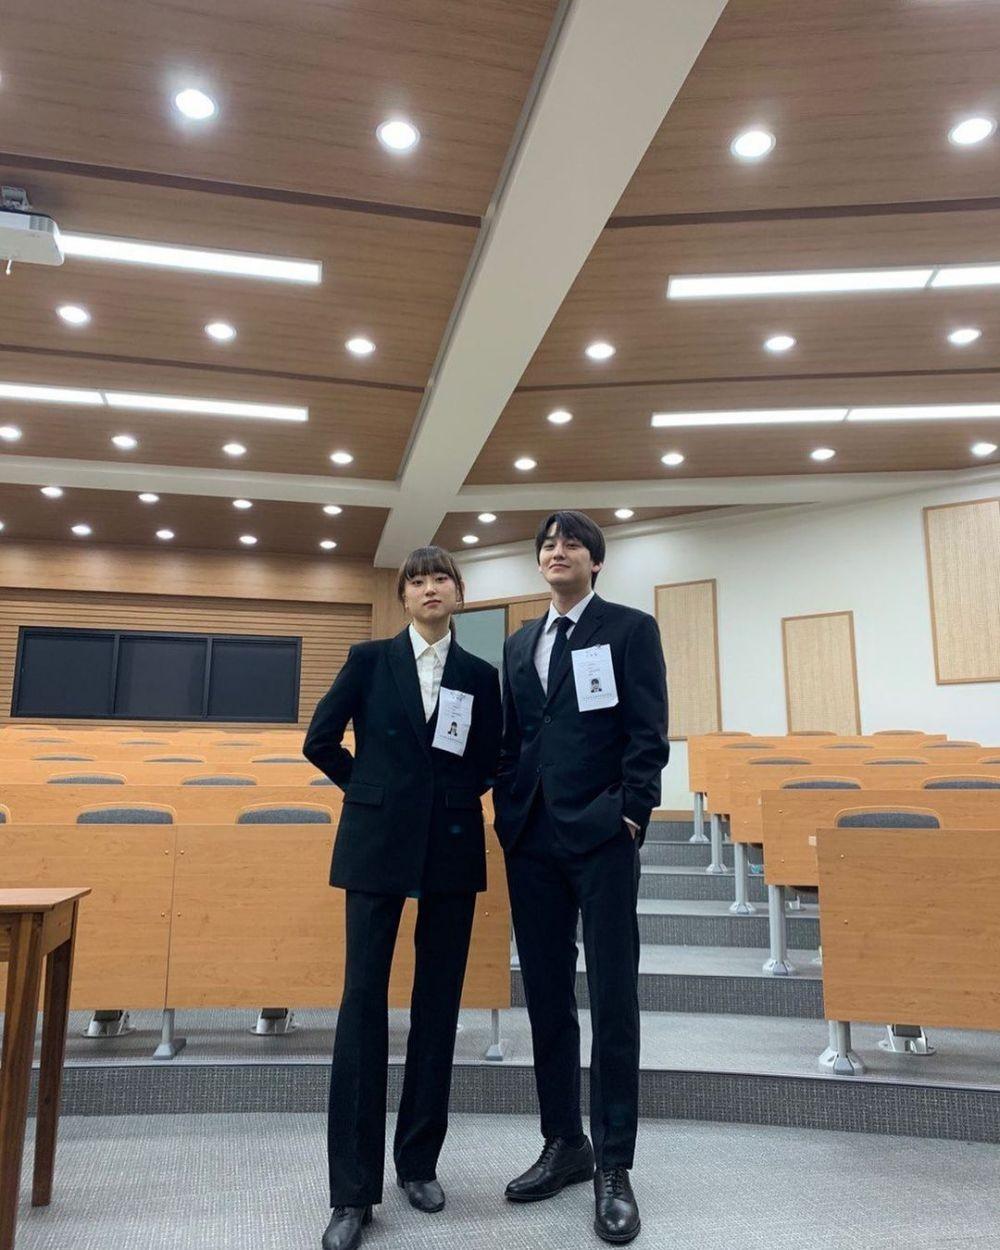 7 Potret Serasi Ryu Hye-young dan Kim Bum di Drama Law School, Bikin Baper Abis - Foto 2